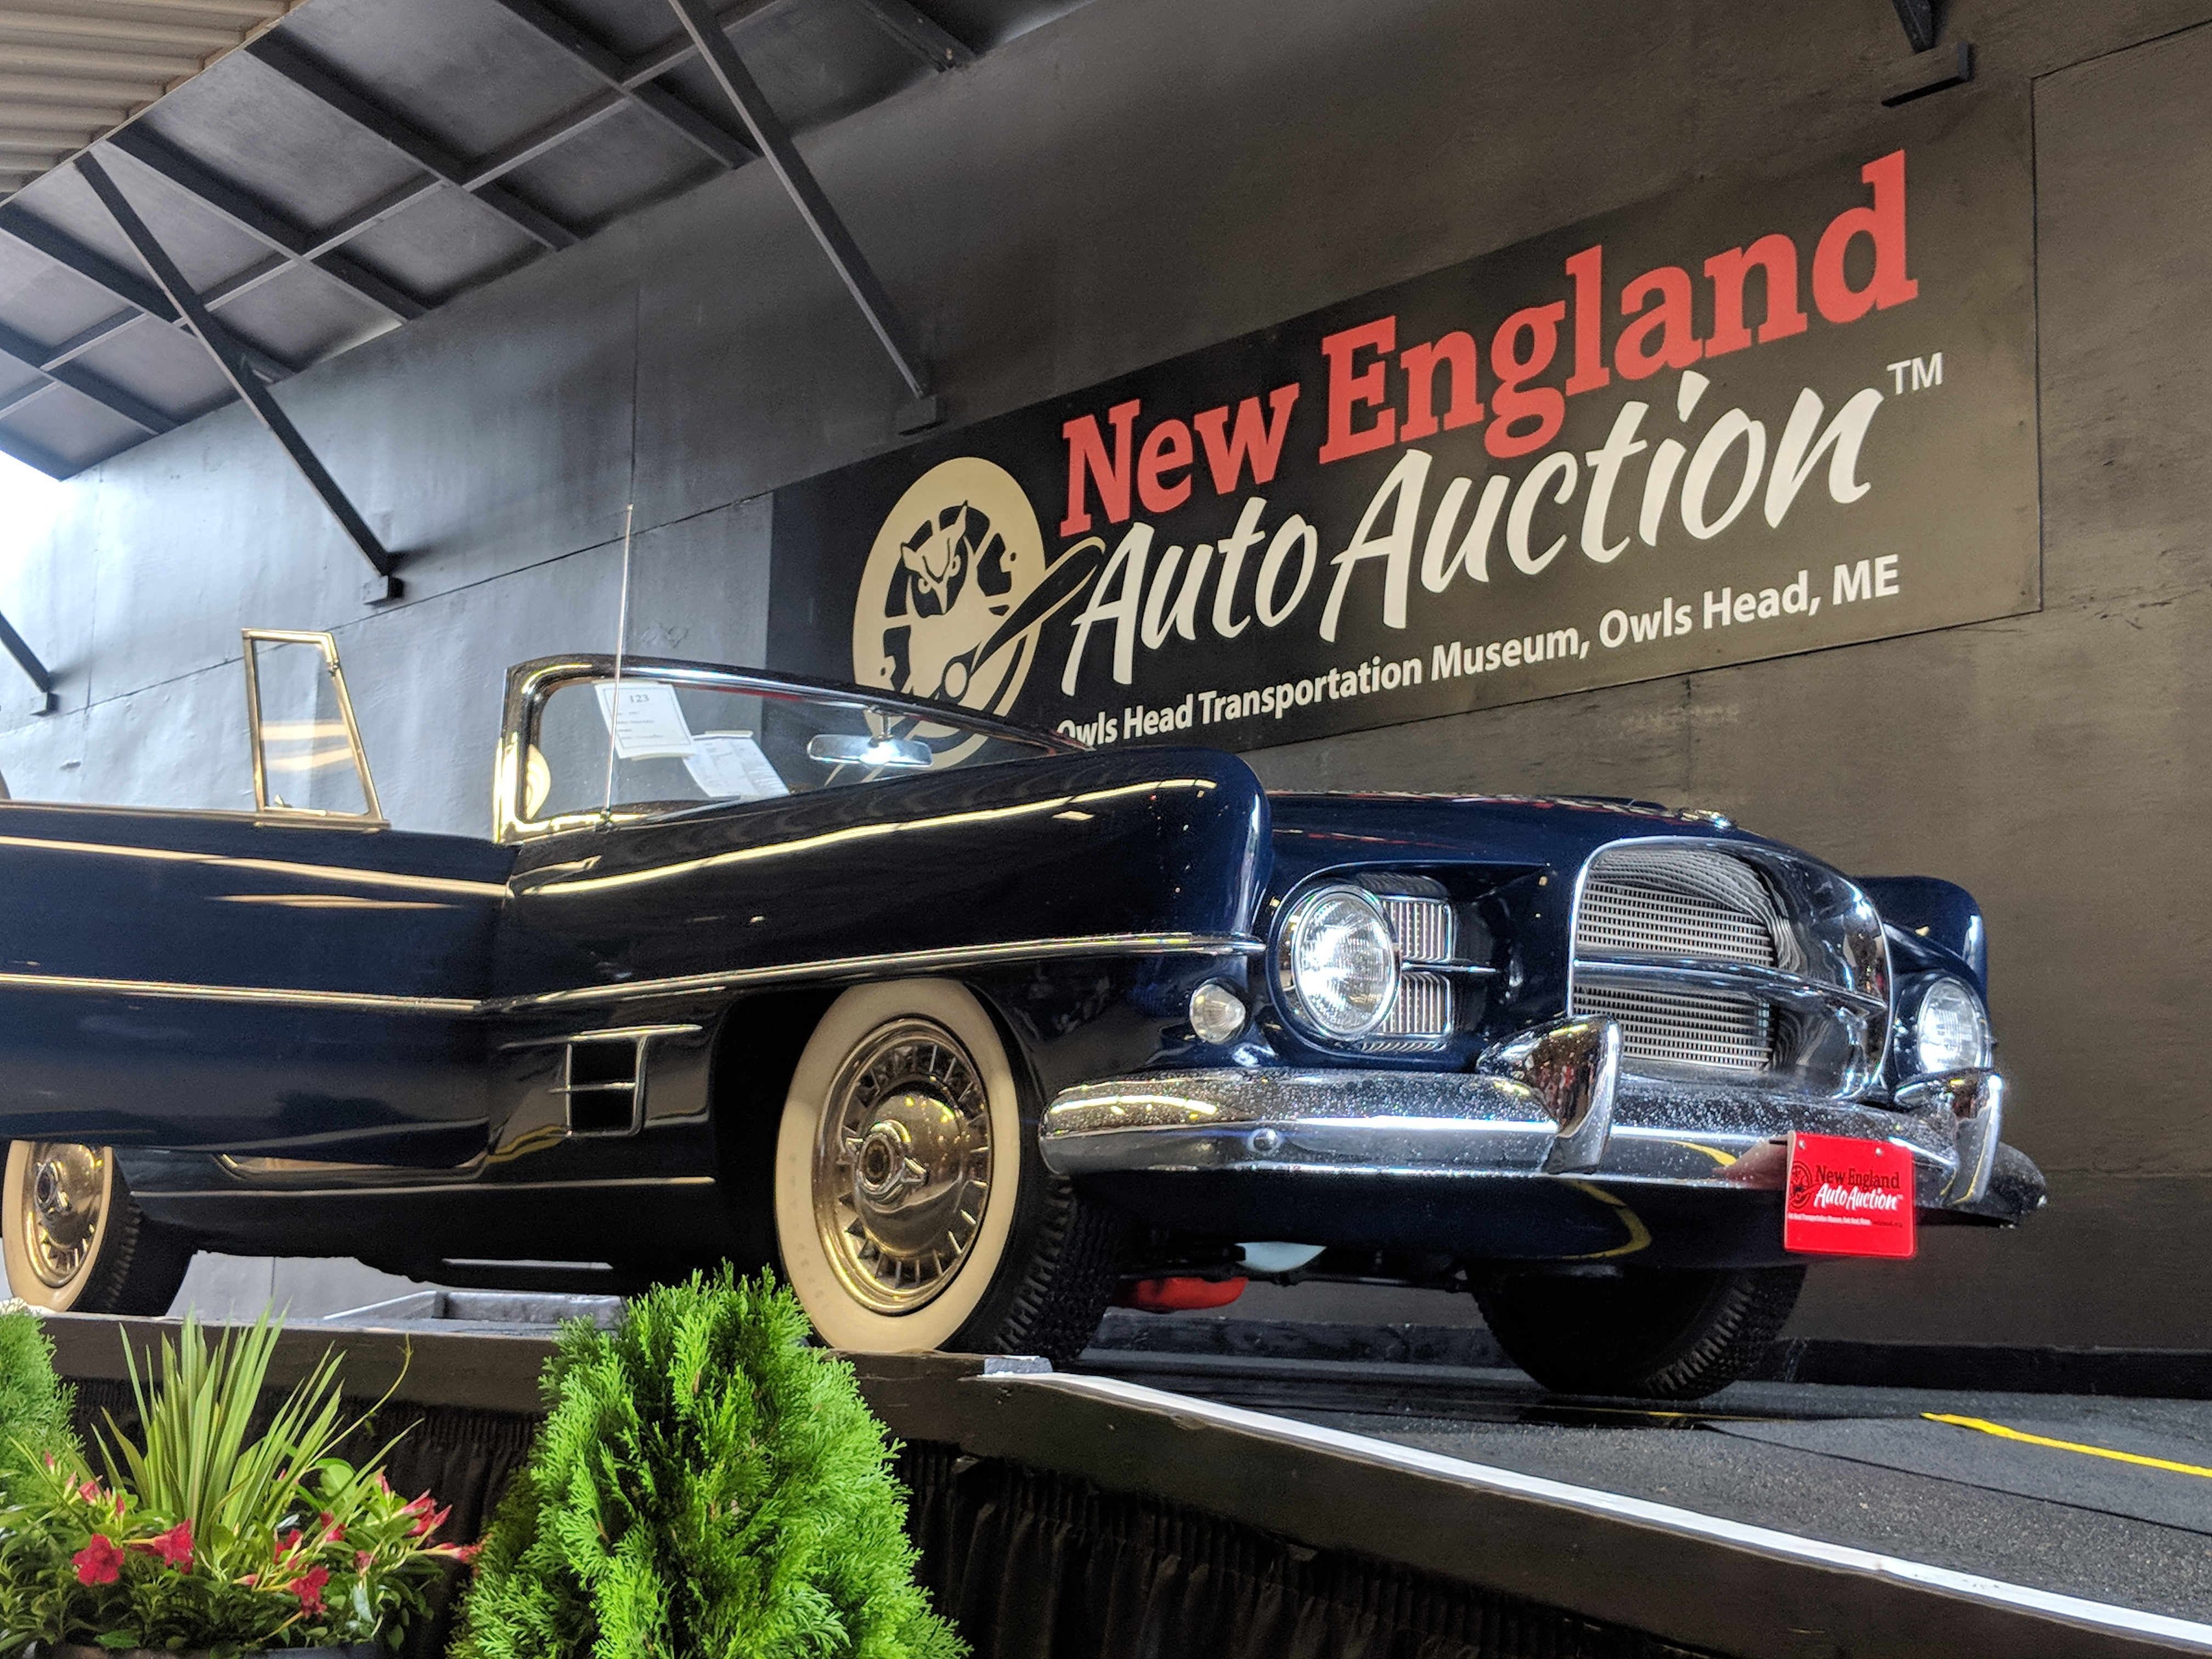 New England, Dual-Ghia tops $4 million New England Auto Auction, ClassicCars.com Journal